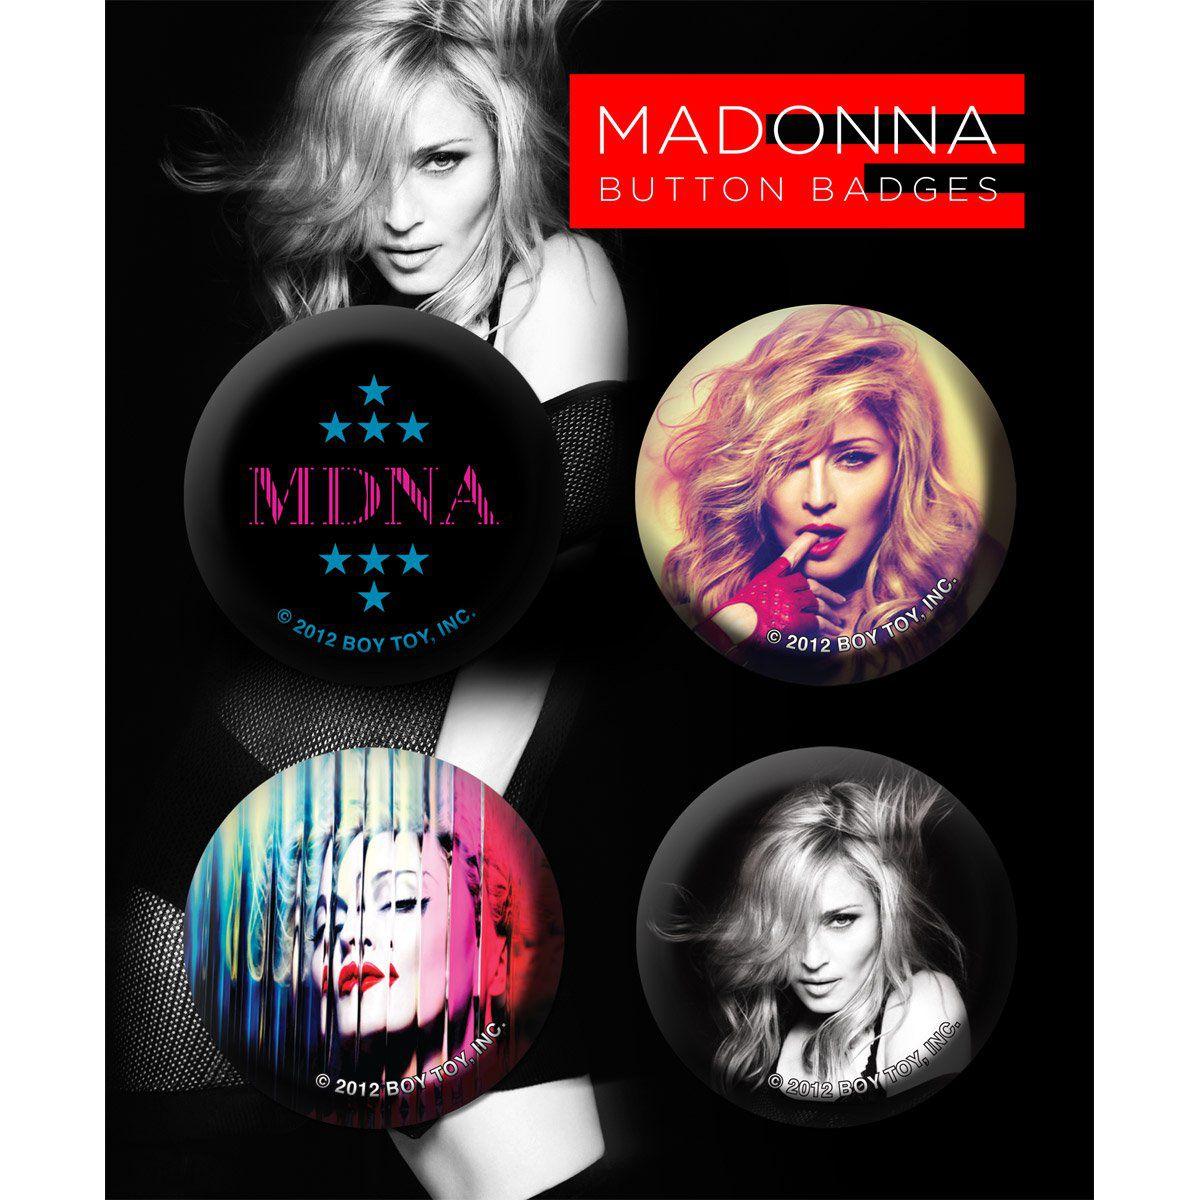 Cartela de Buttons Madonna Modelo 1  - bandUP Store Marketplace